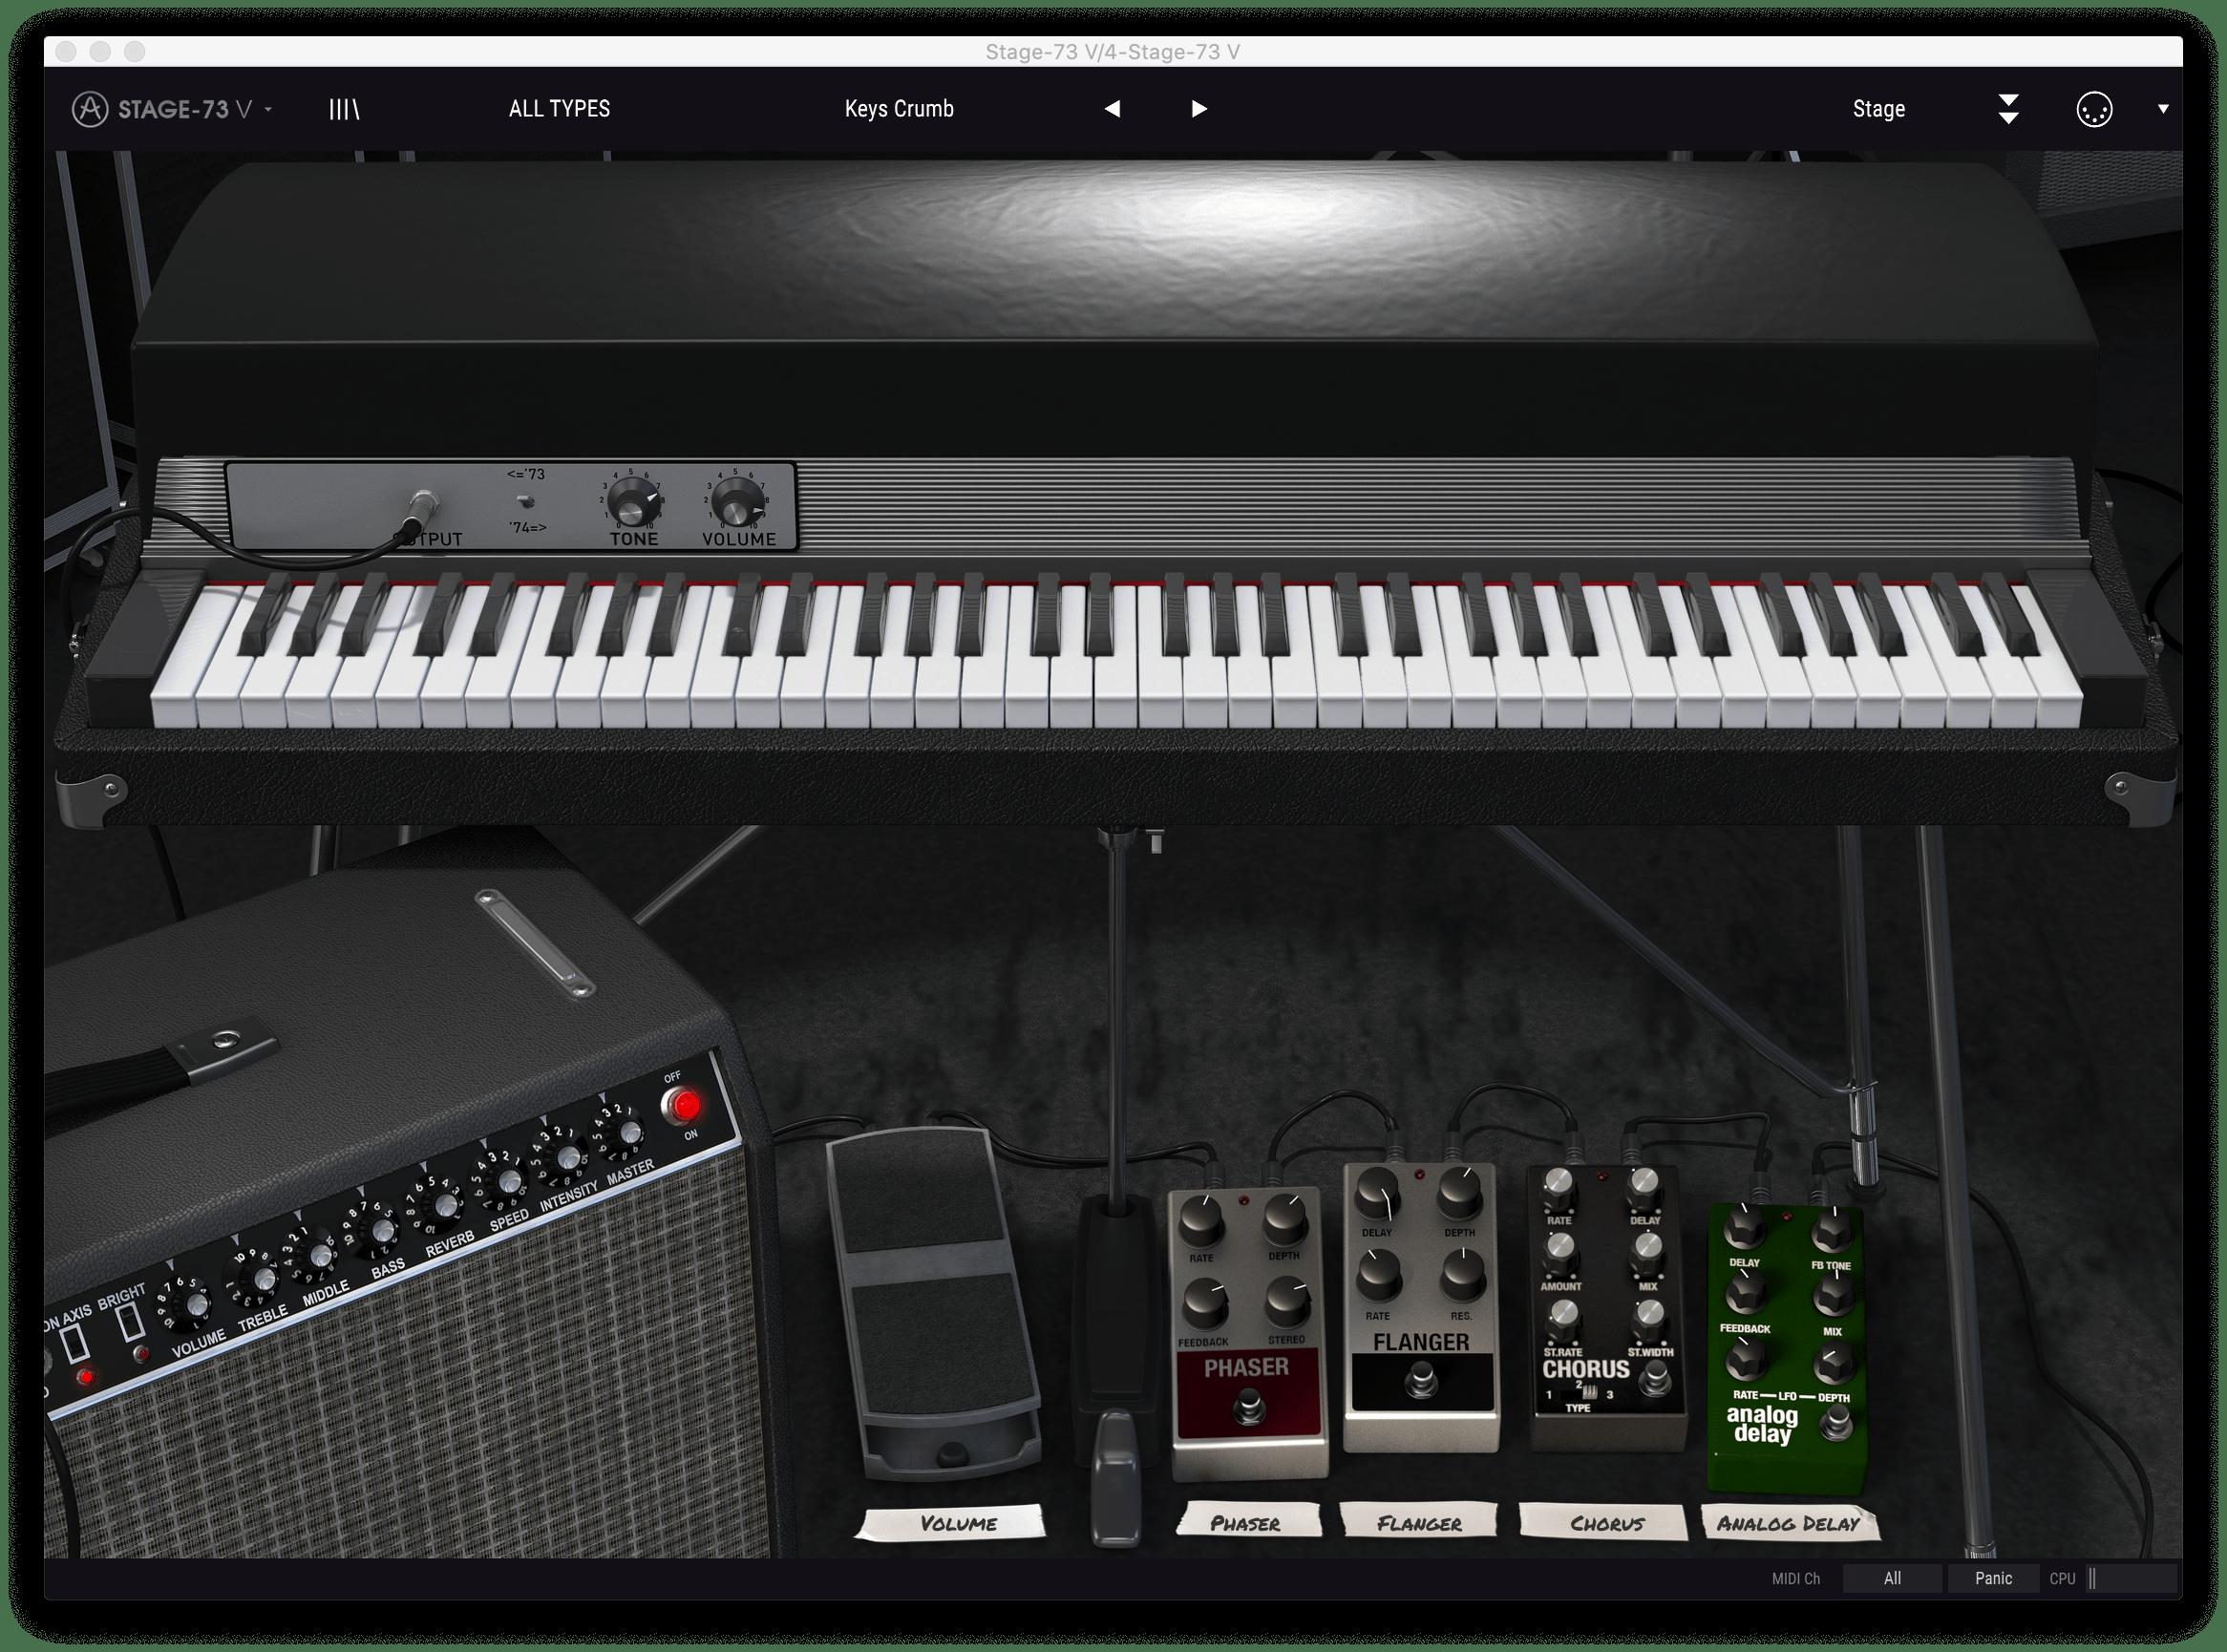 piano crumb keys